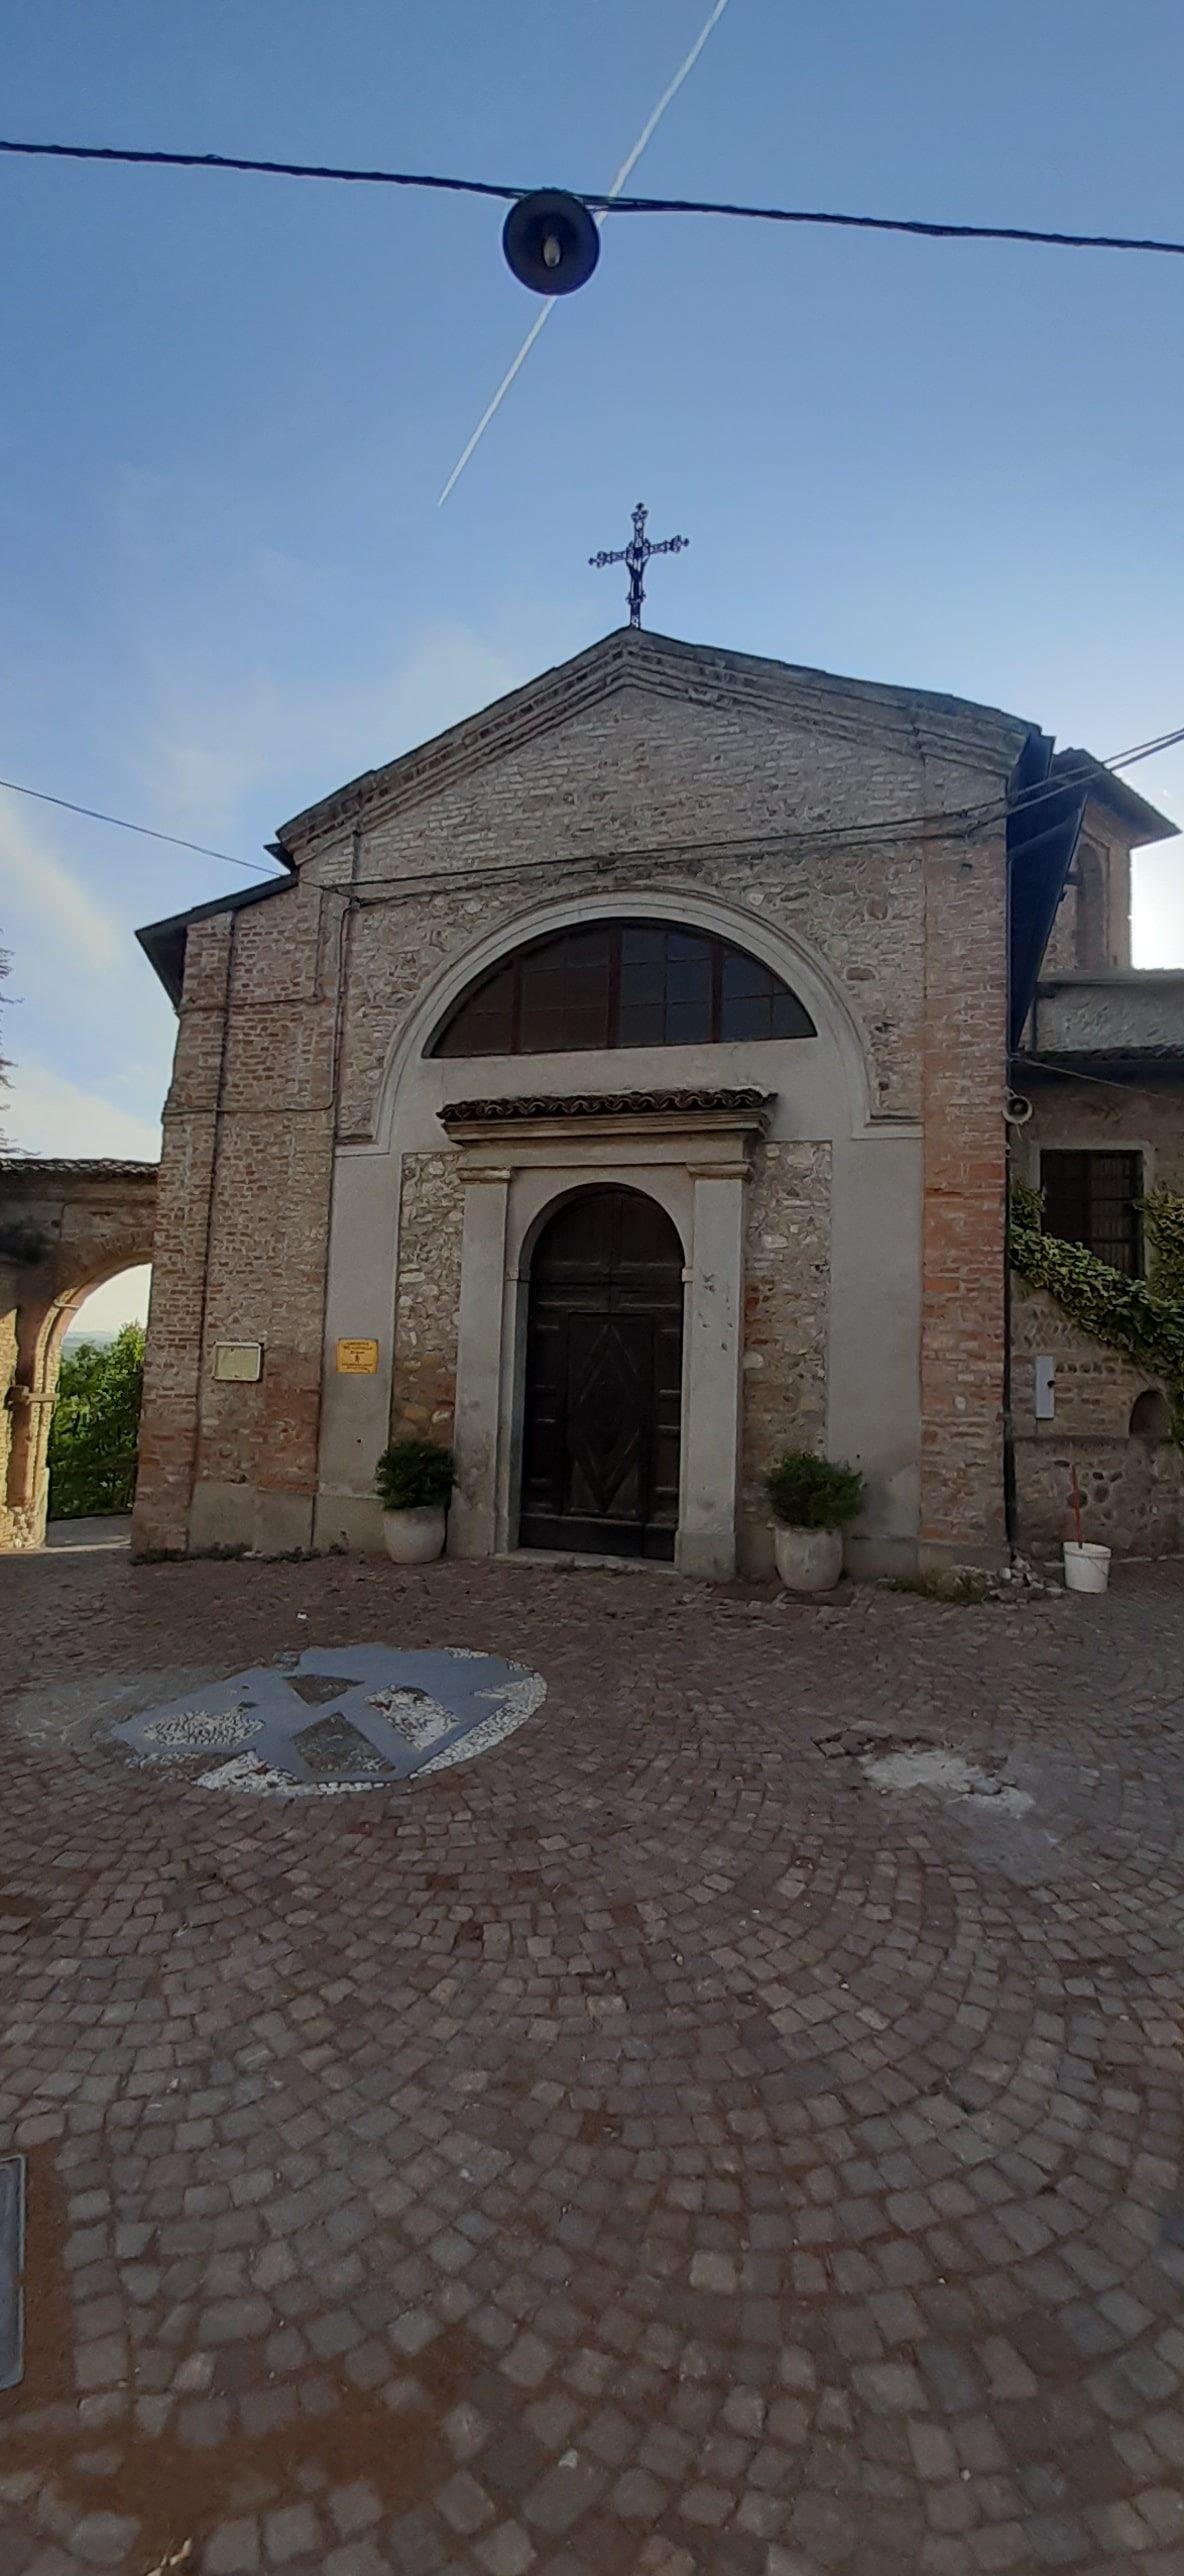 chiesa-del-borgo-antico_74597